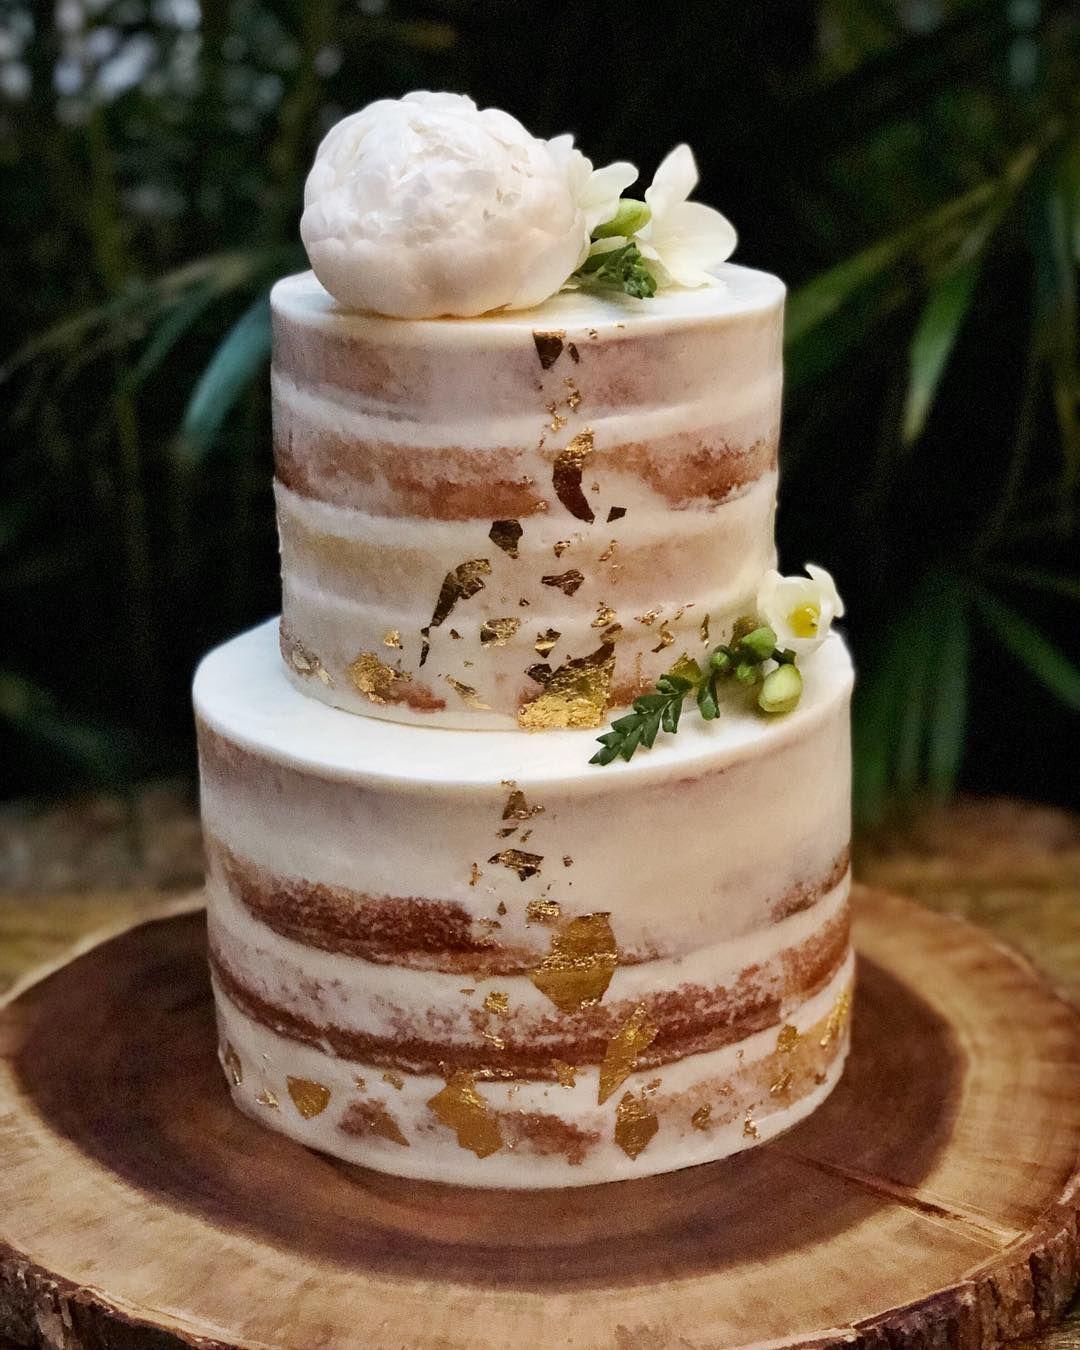 Fondant-haters Rejoice: Naked Wedding Cakes - wpic.ca